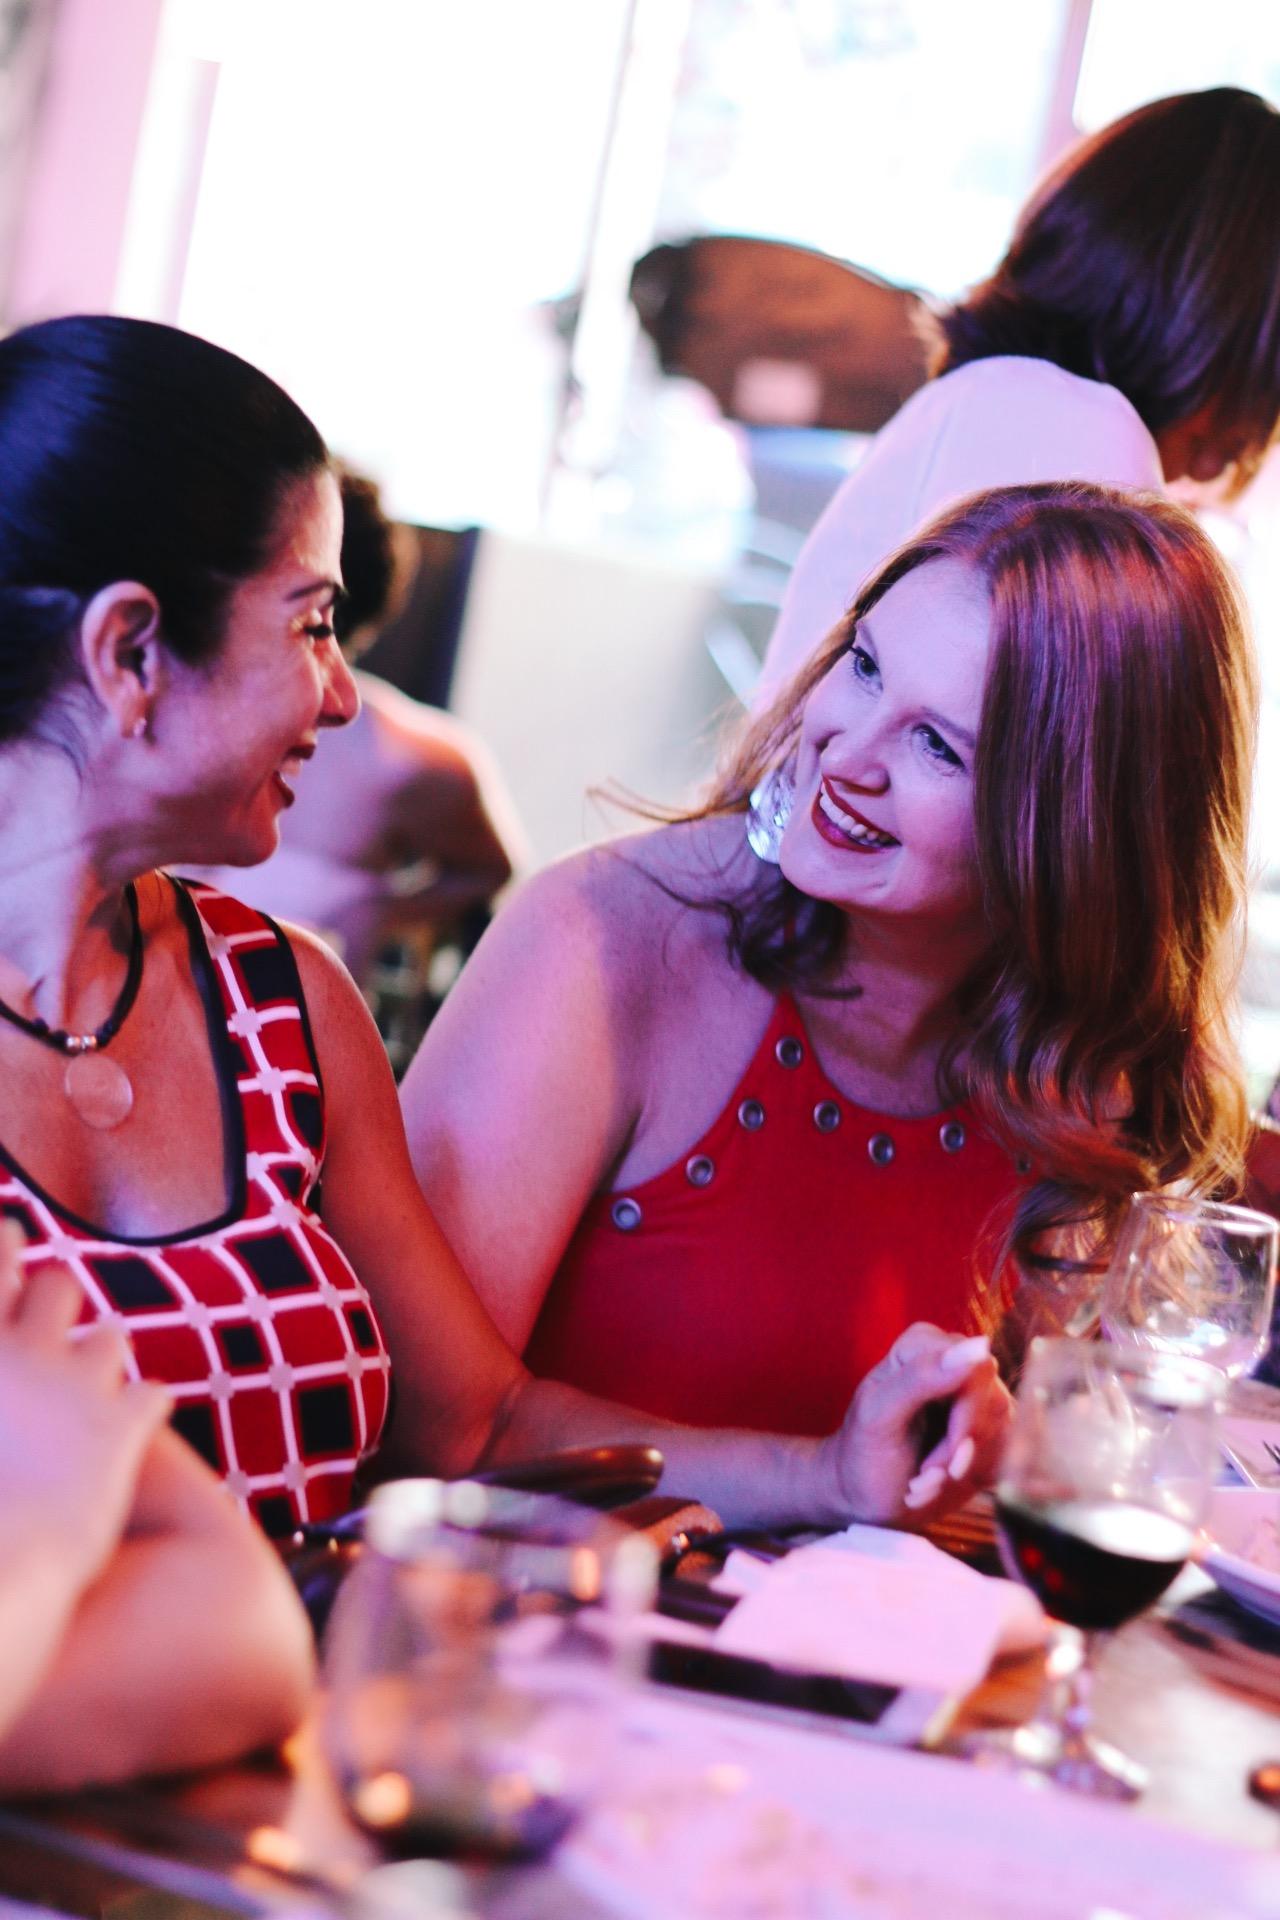 Women Who Wine-Uncorked Conversations-Eat Greek-Miami Wine Events-Wine Tasting Miami-45.jpg